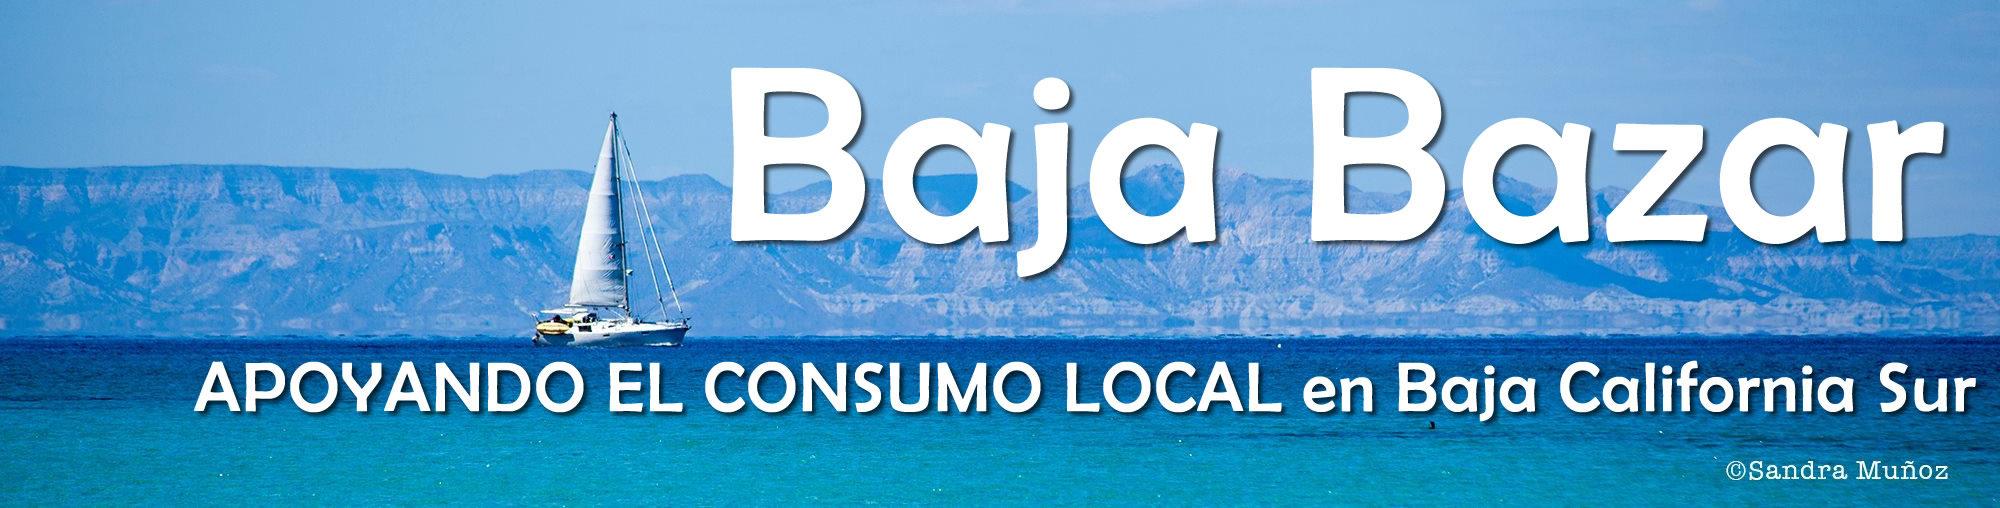 Bajabazar.com.mx